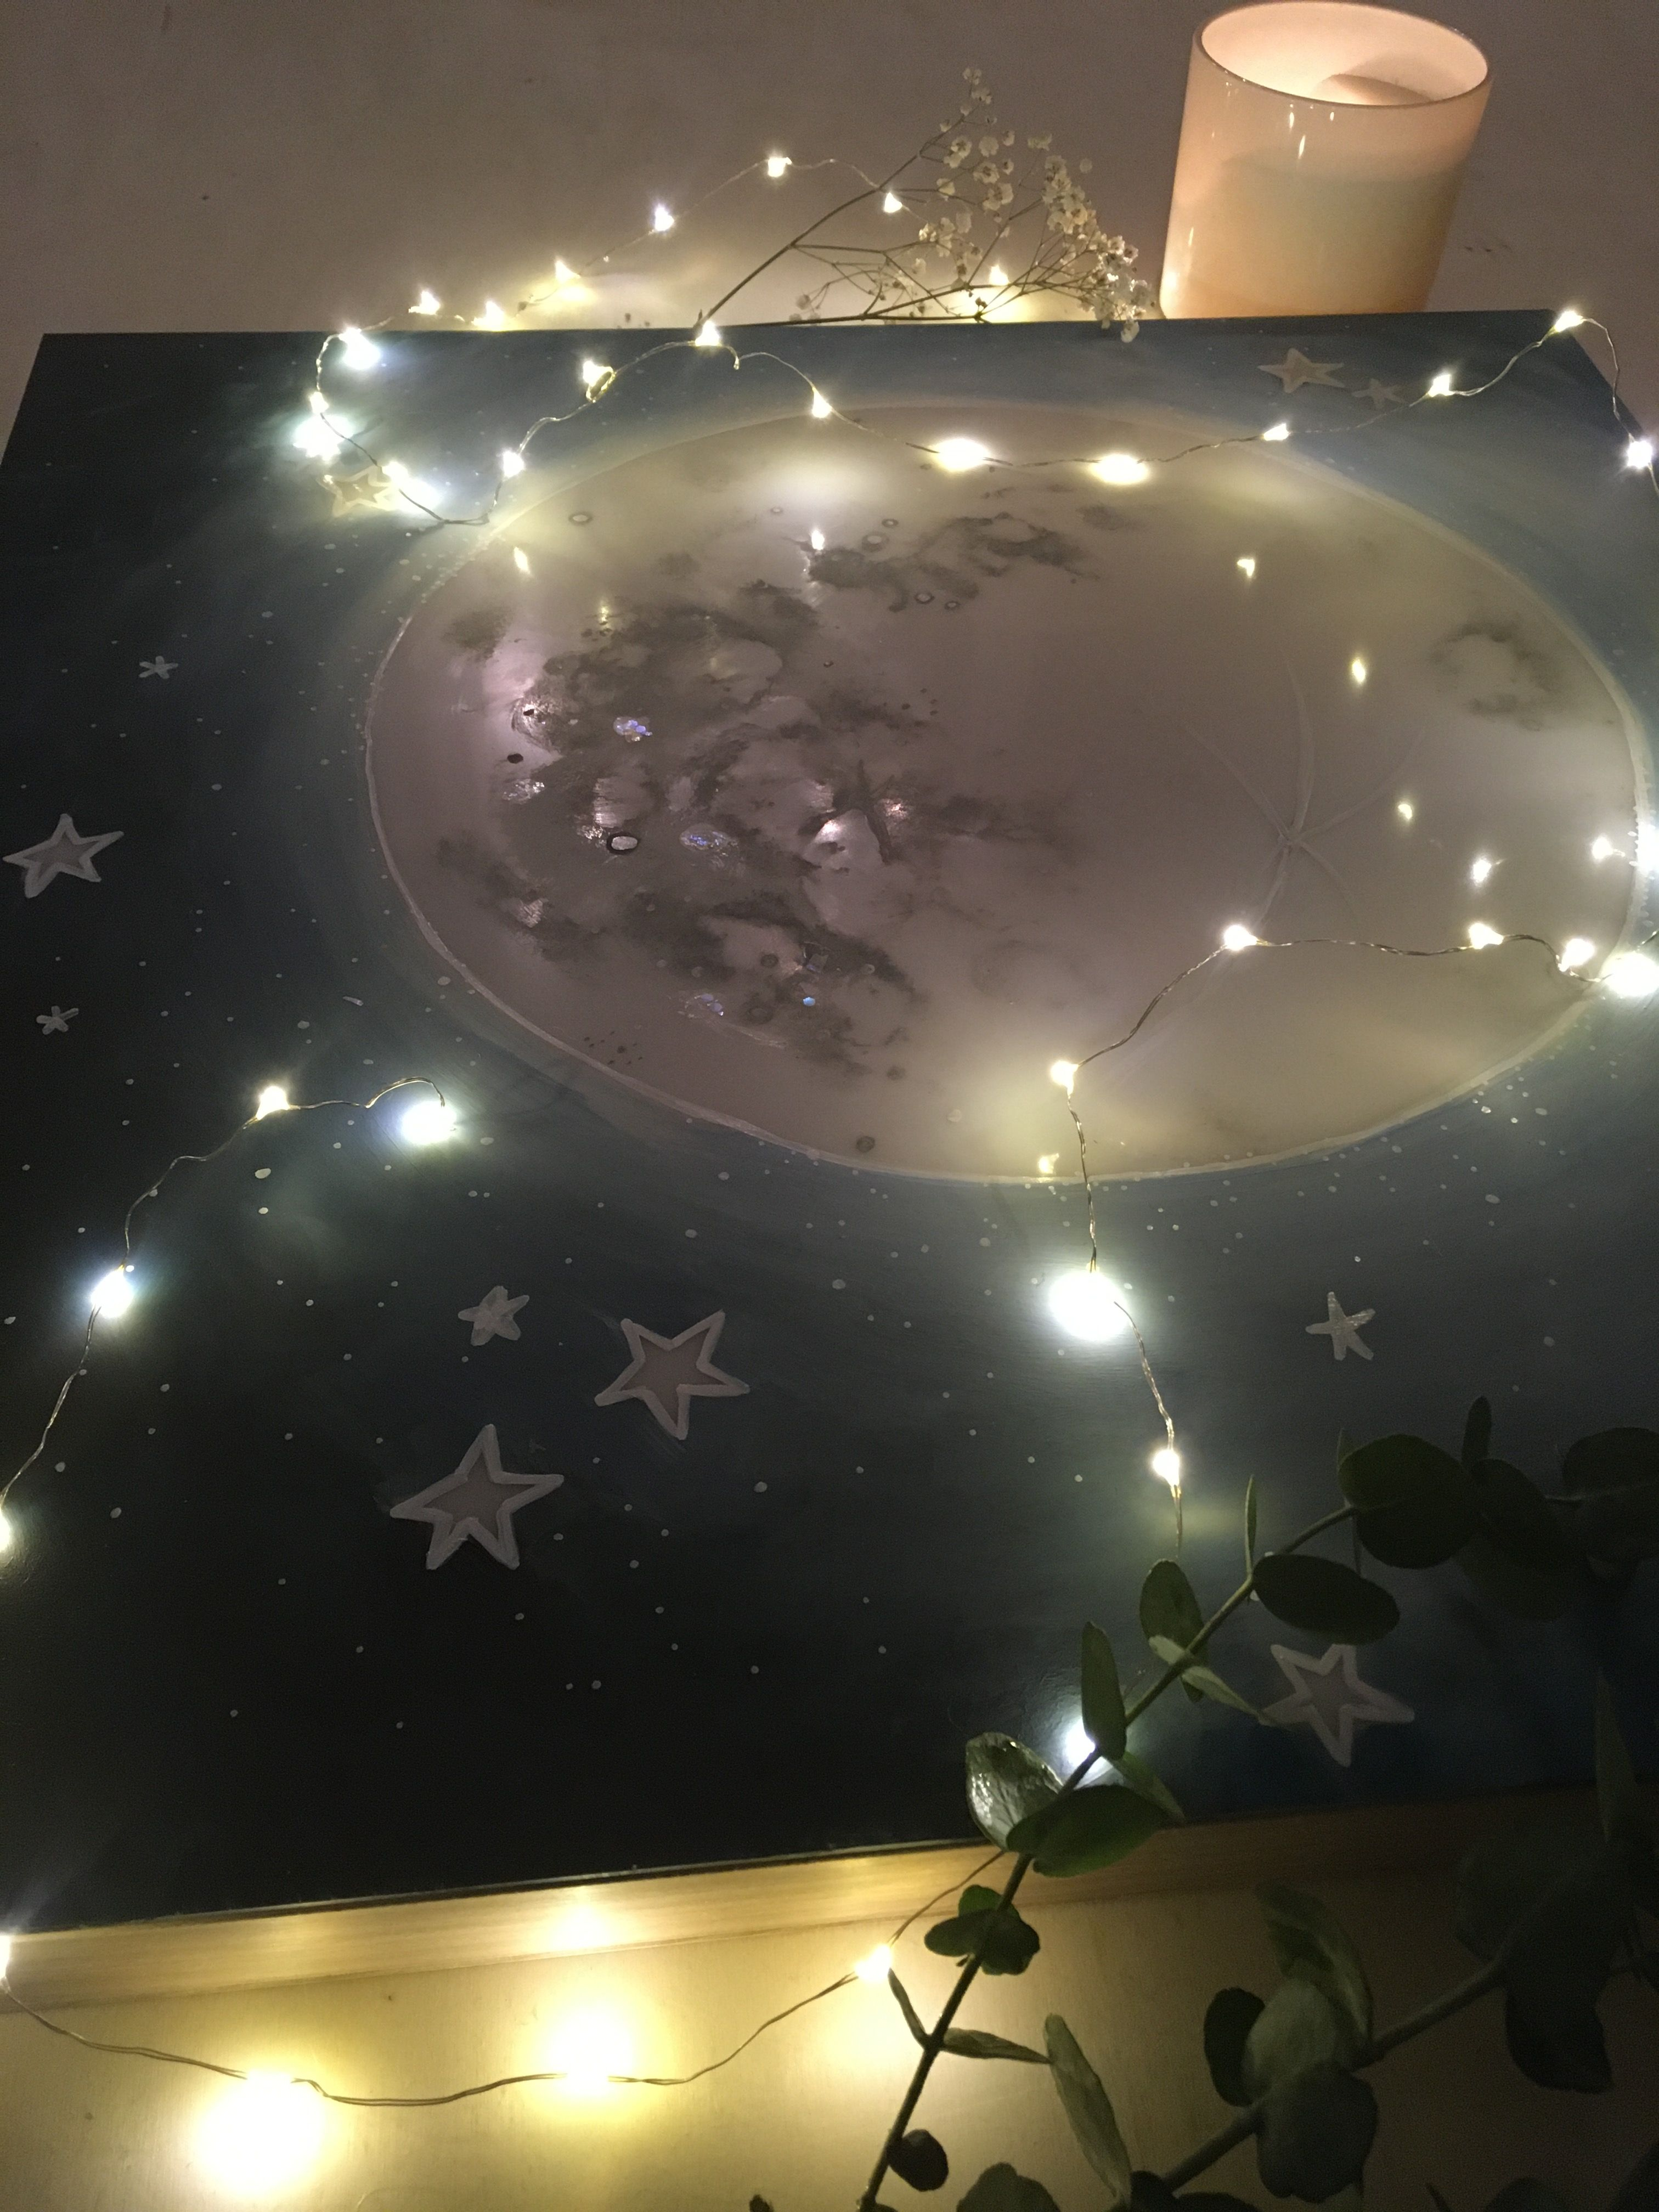 Moonlight Mond Lampe Hochzeitsfloristik Trockenblumen